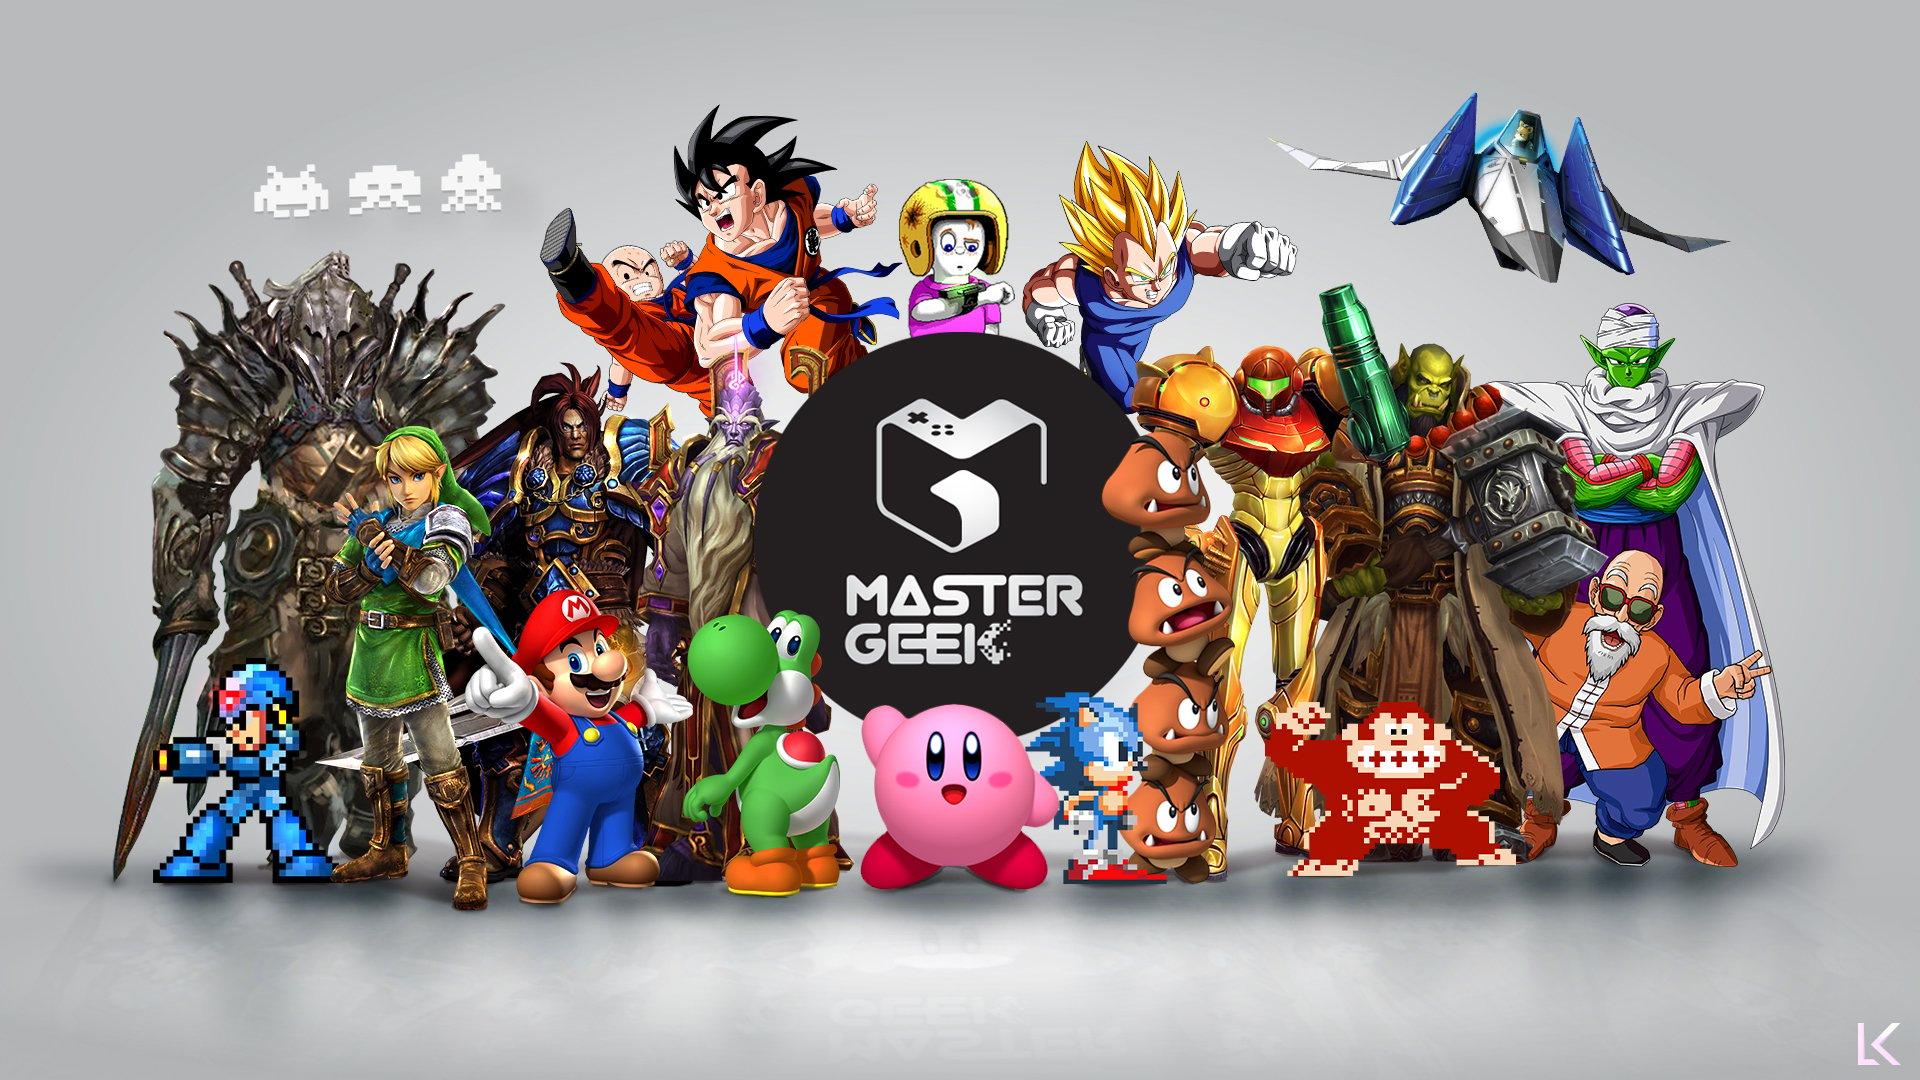 Mastergeek